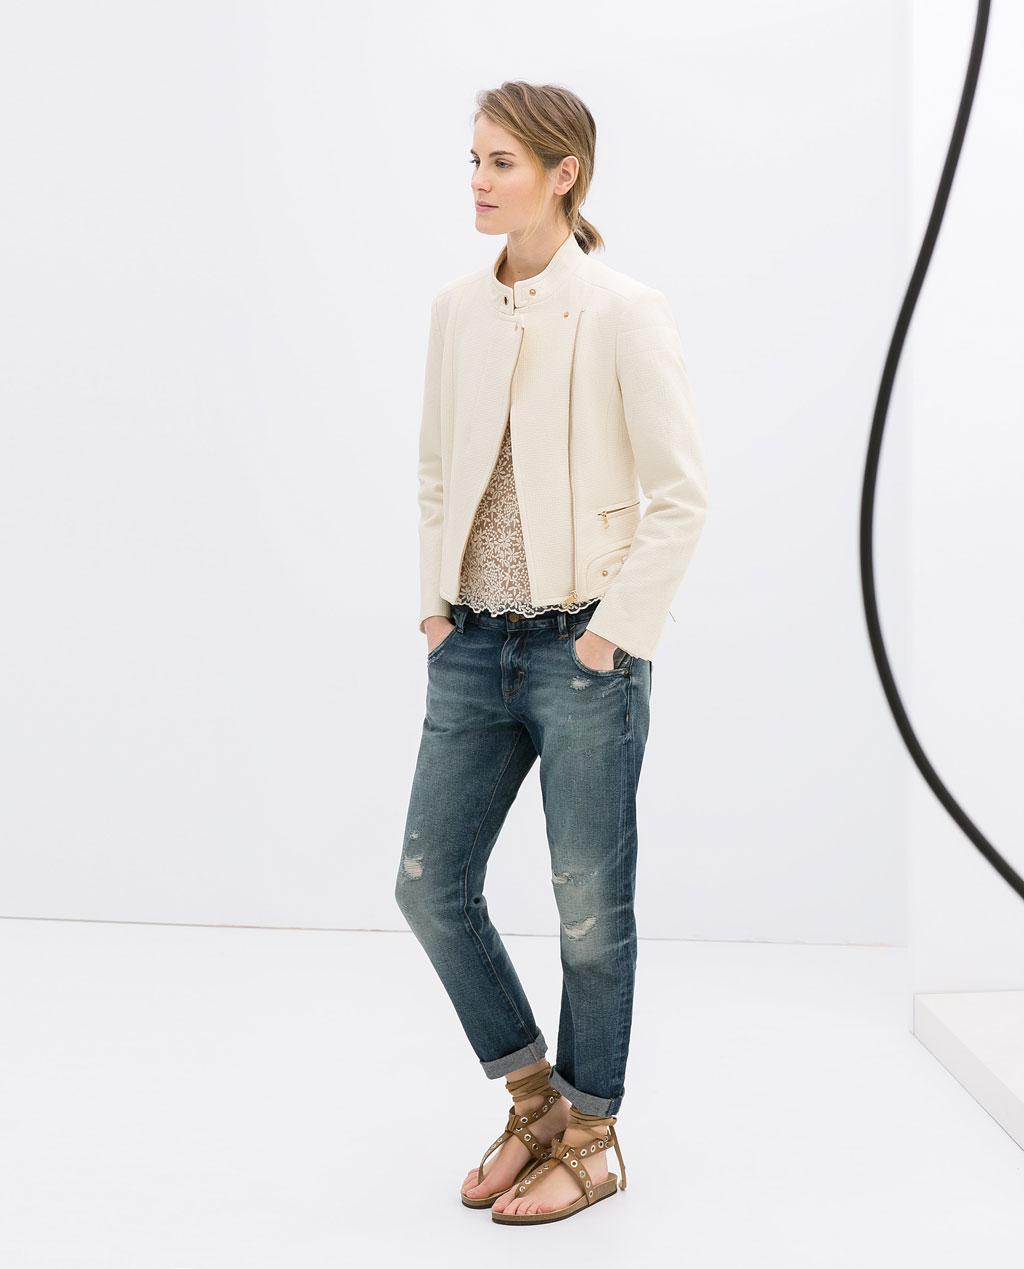 Zara-Look-4